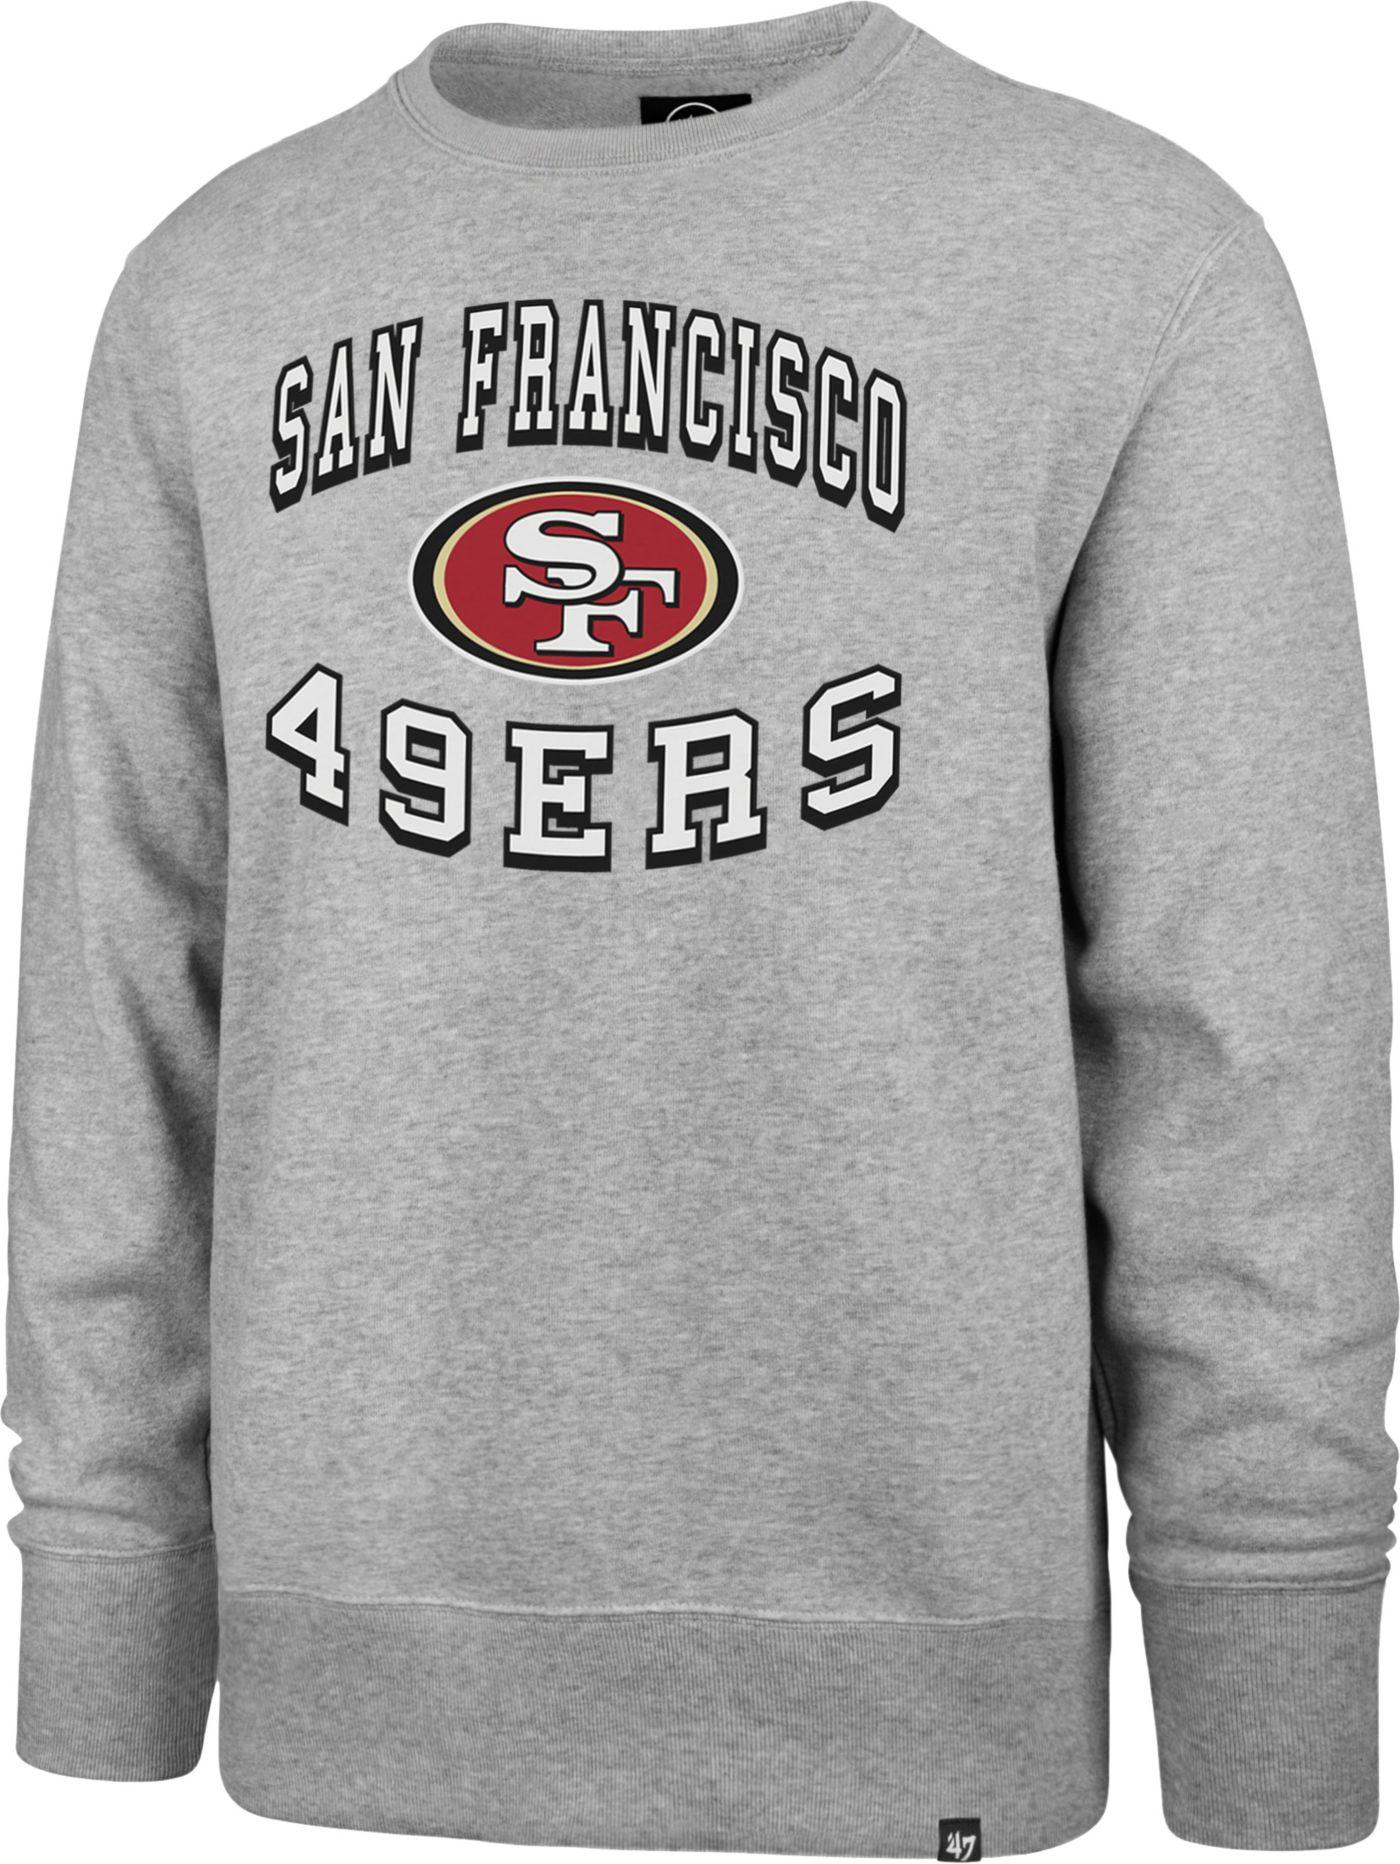 '47 Men's San Francisco 49ers Headline Grey Crew